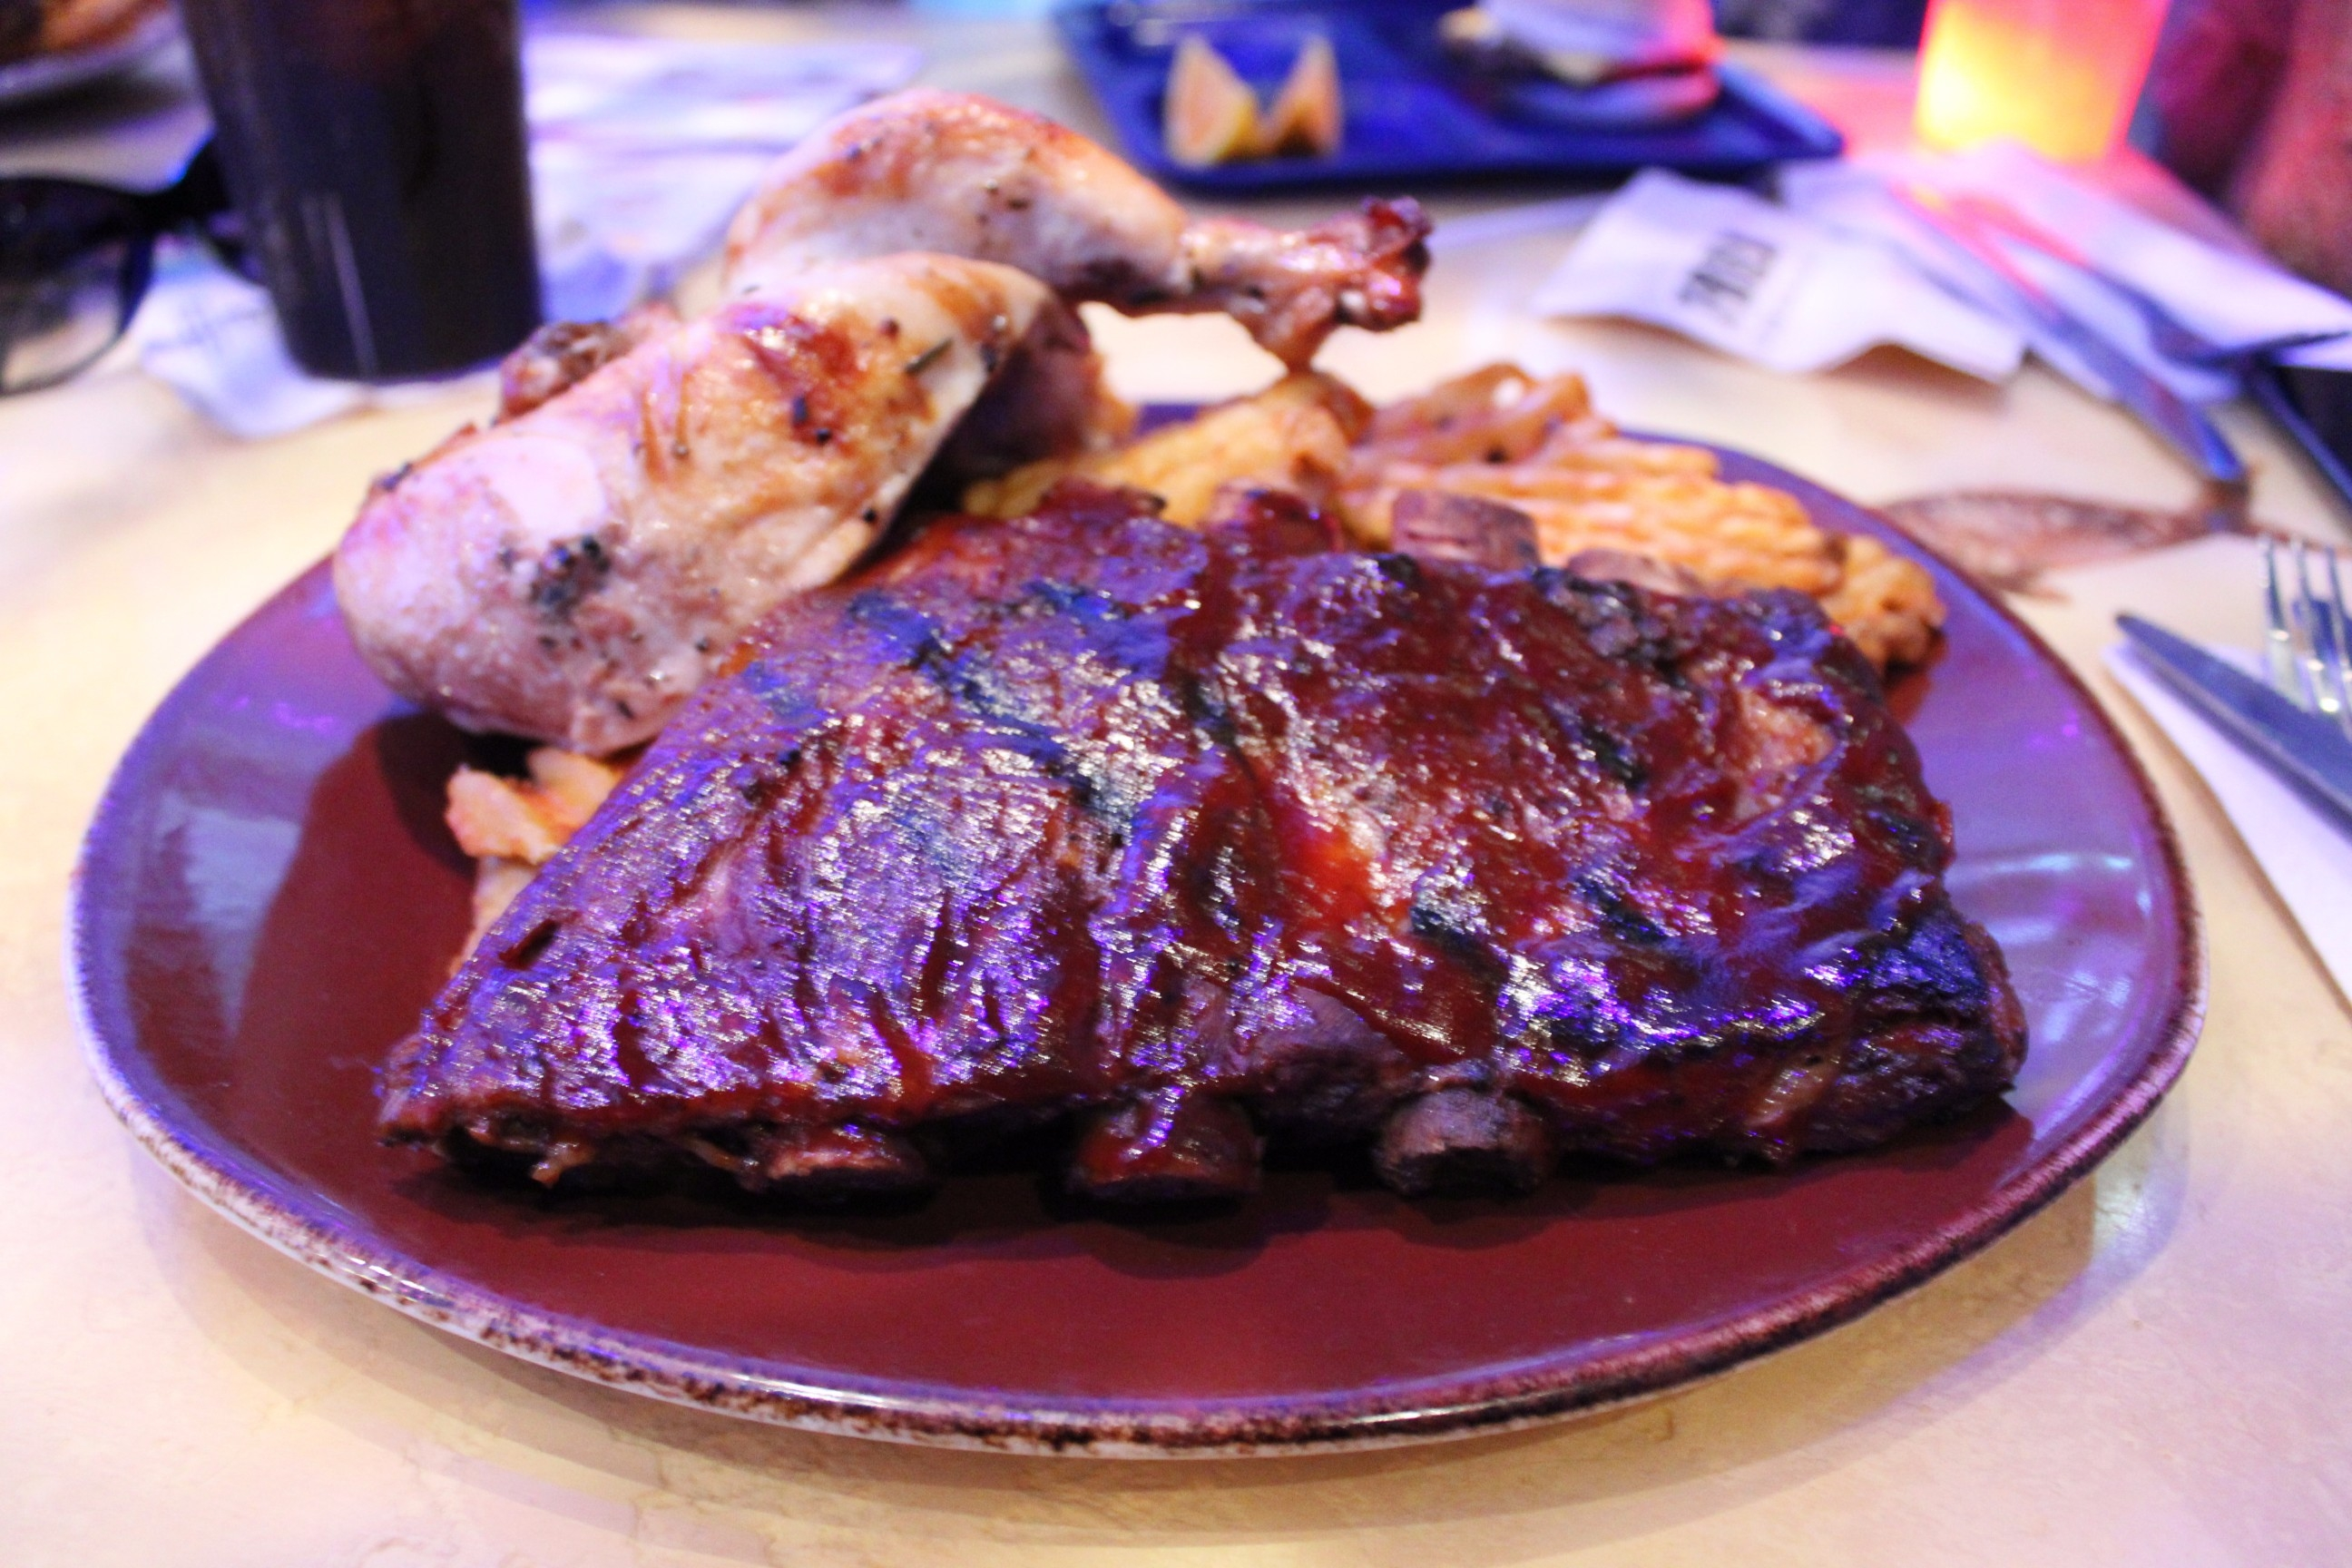 TREX Food Photos Restaurant Review Disney Springs (12)